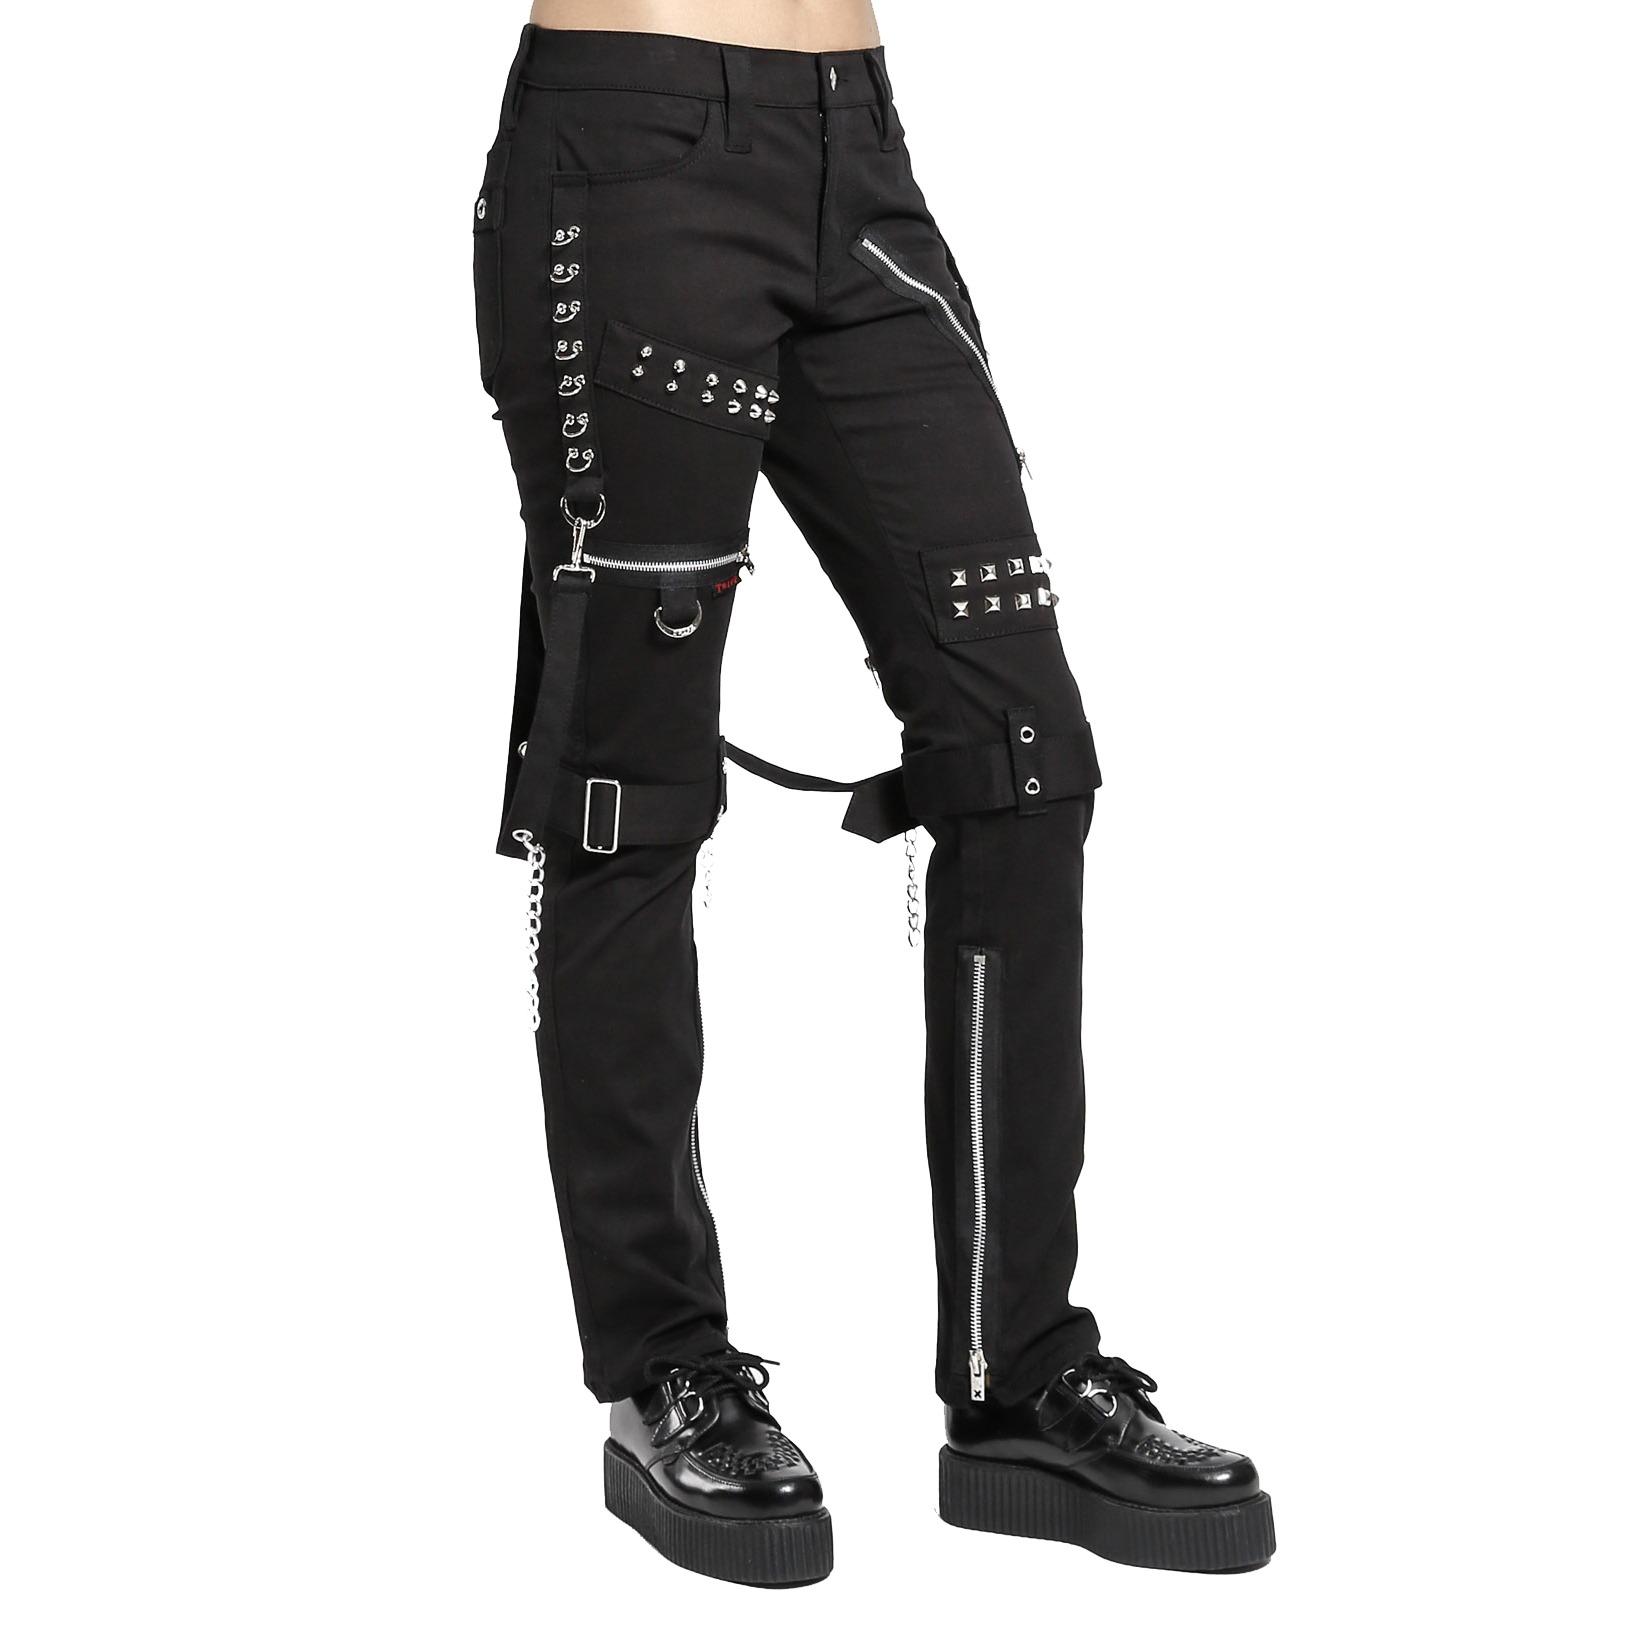 Gothic Rave Black Chain Rock Star Straps Metal Punk Show Pants